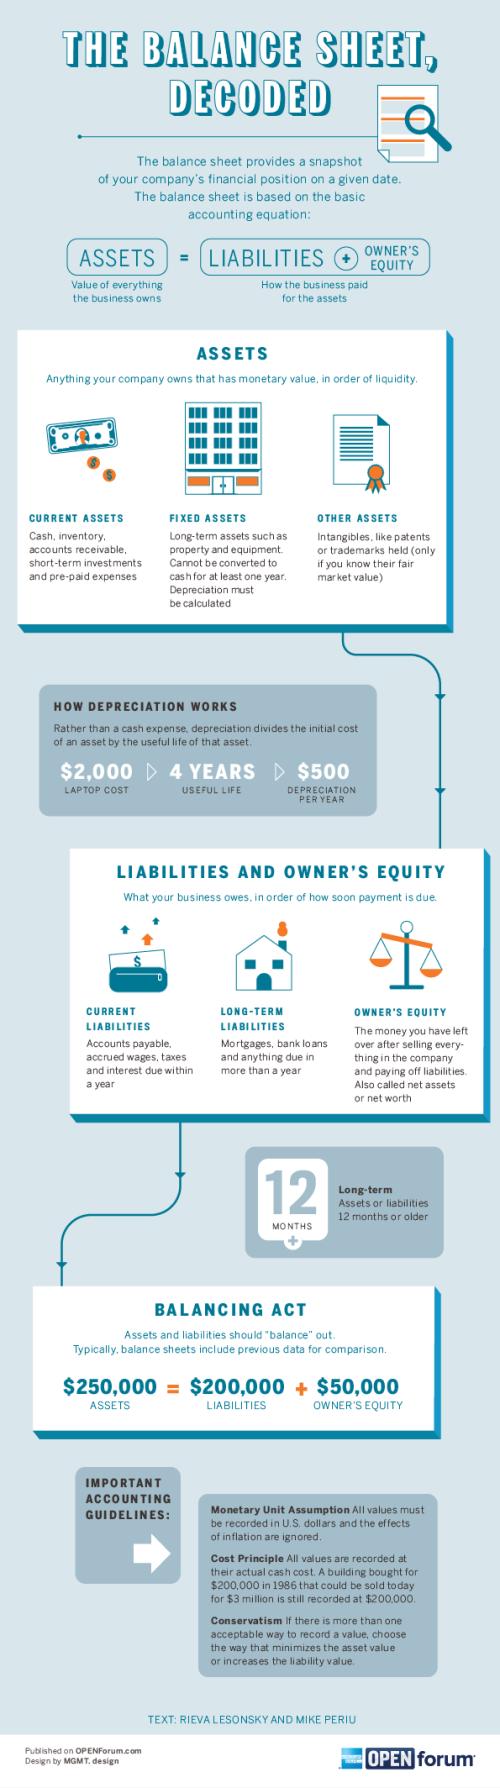 amex_01_balance_sheet_infographic1